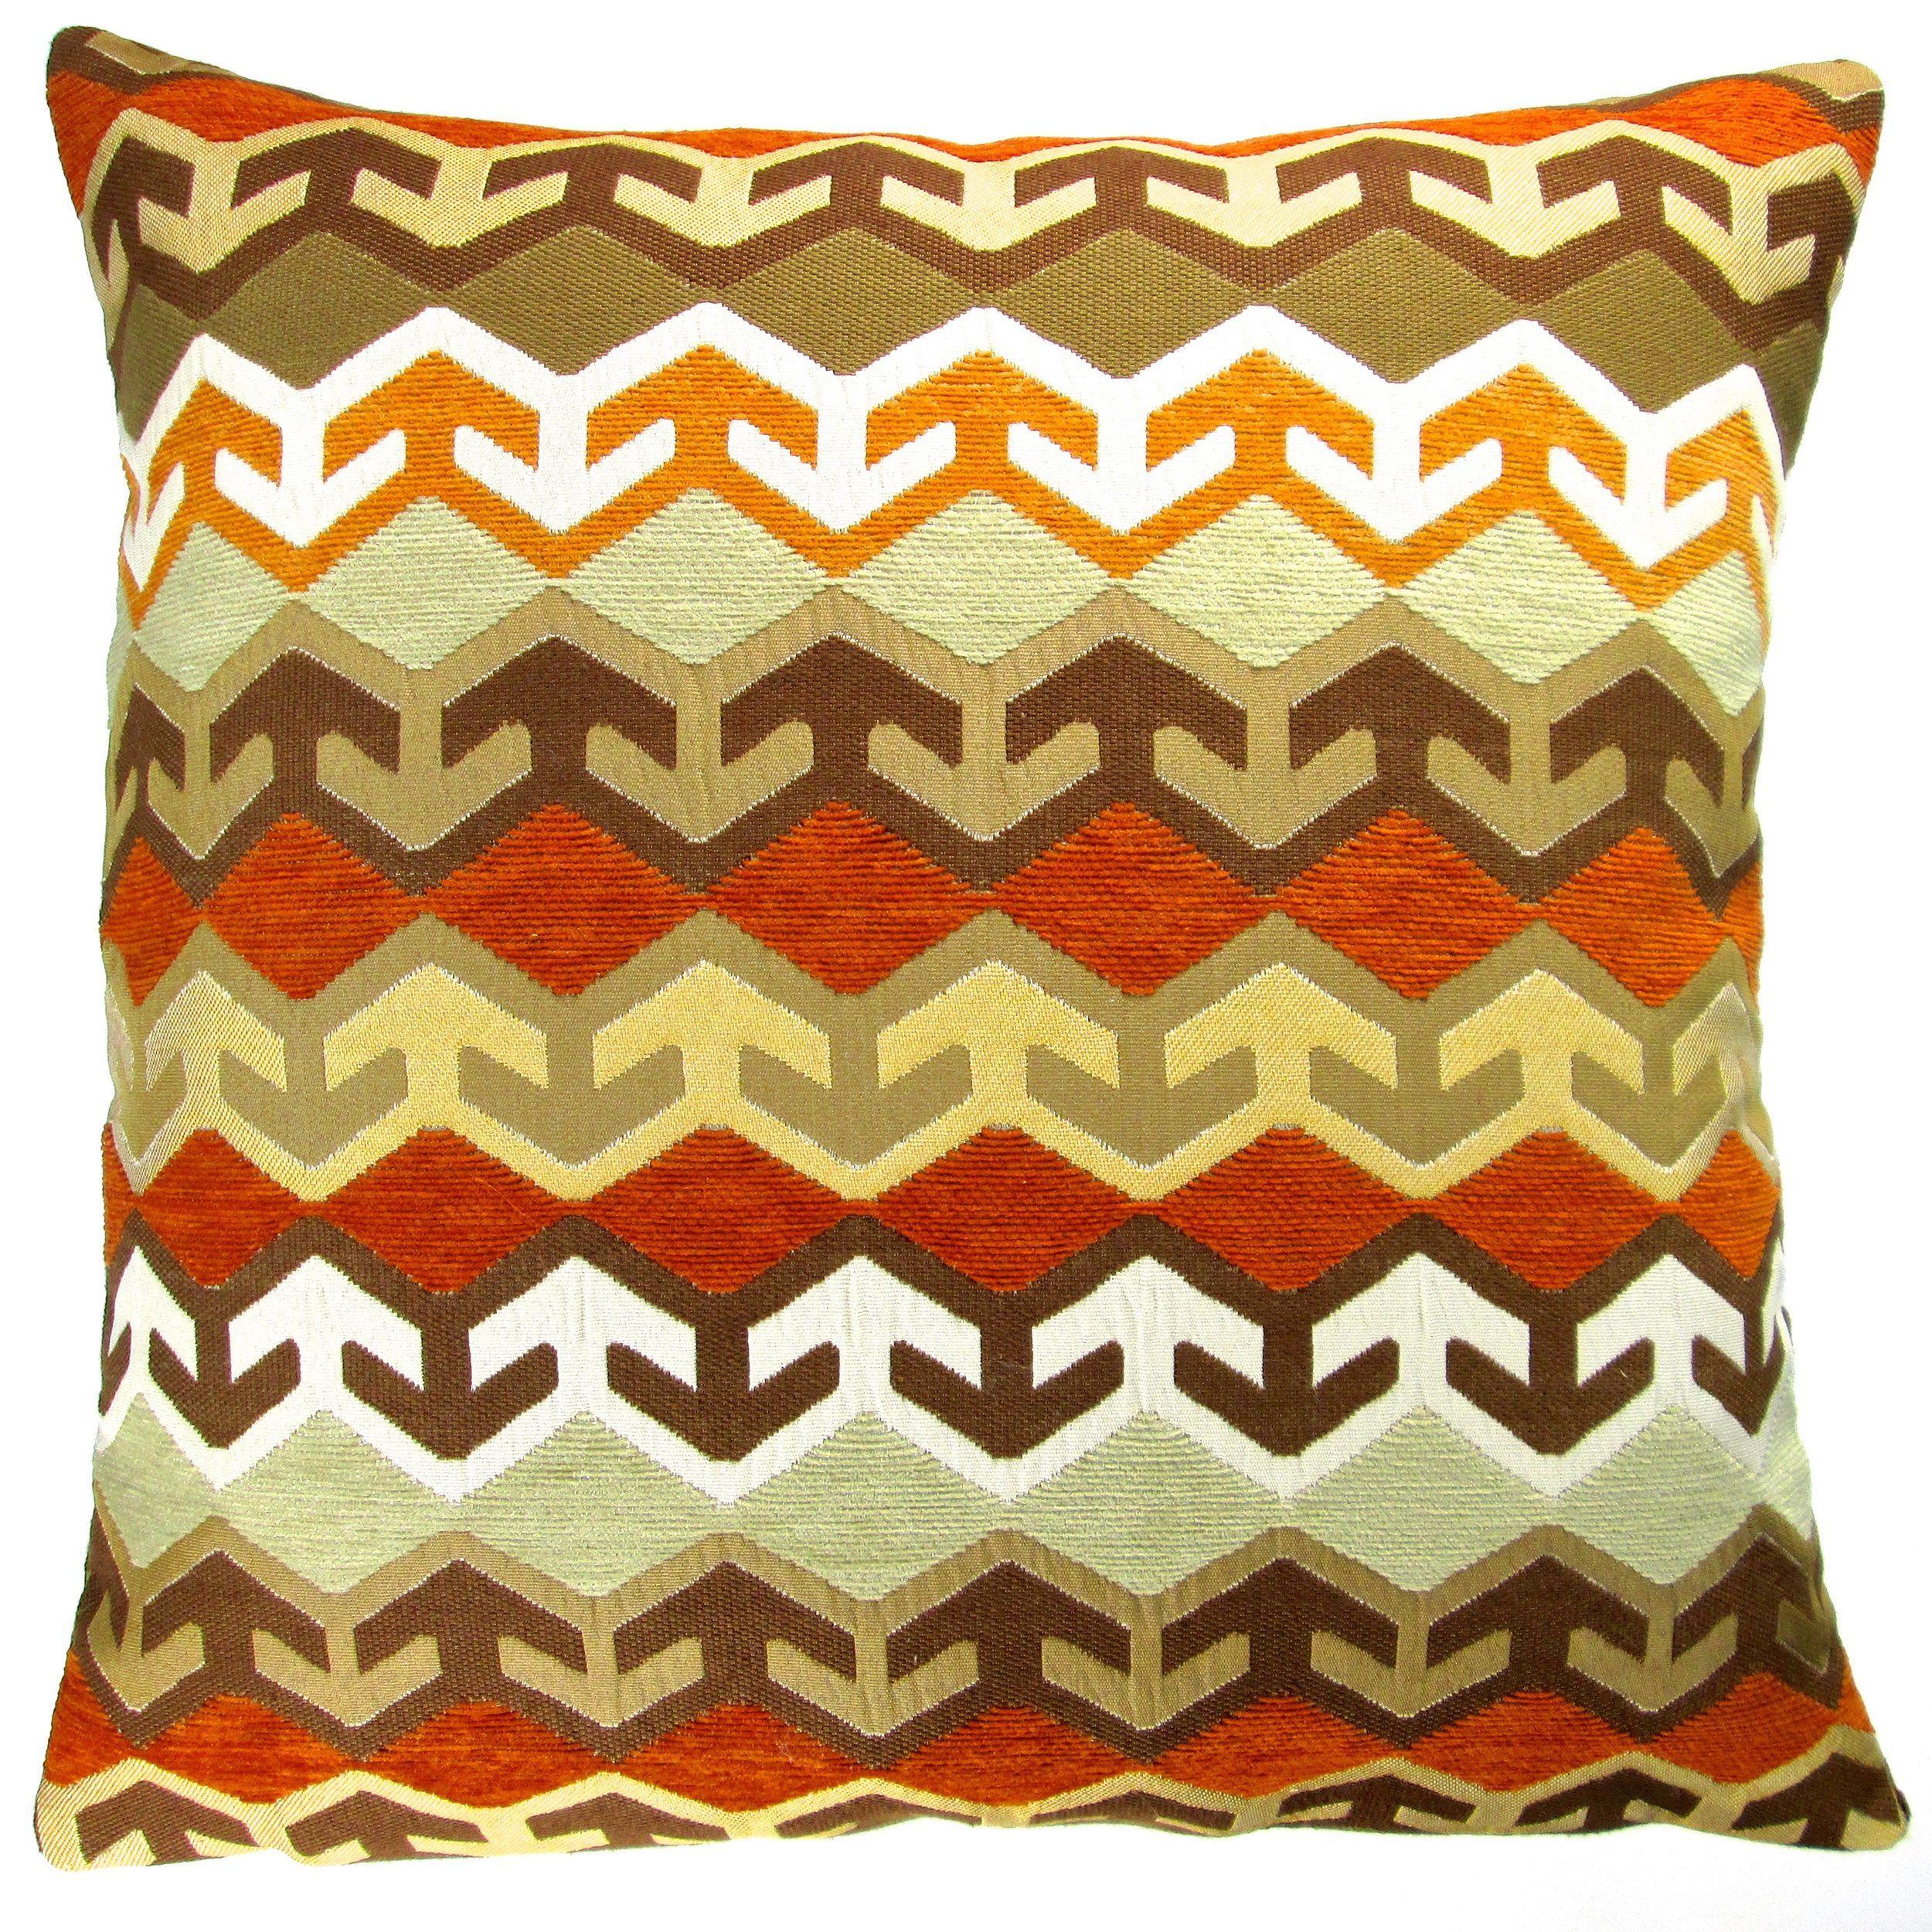 Artisan Pillows 20 Inch Geometric Arrow Accent Throw Pillow Cover